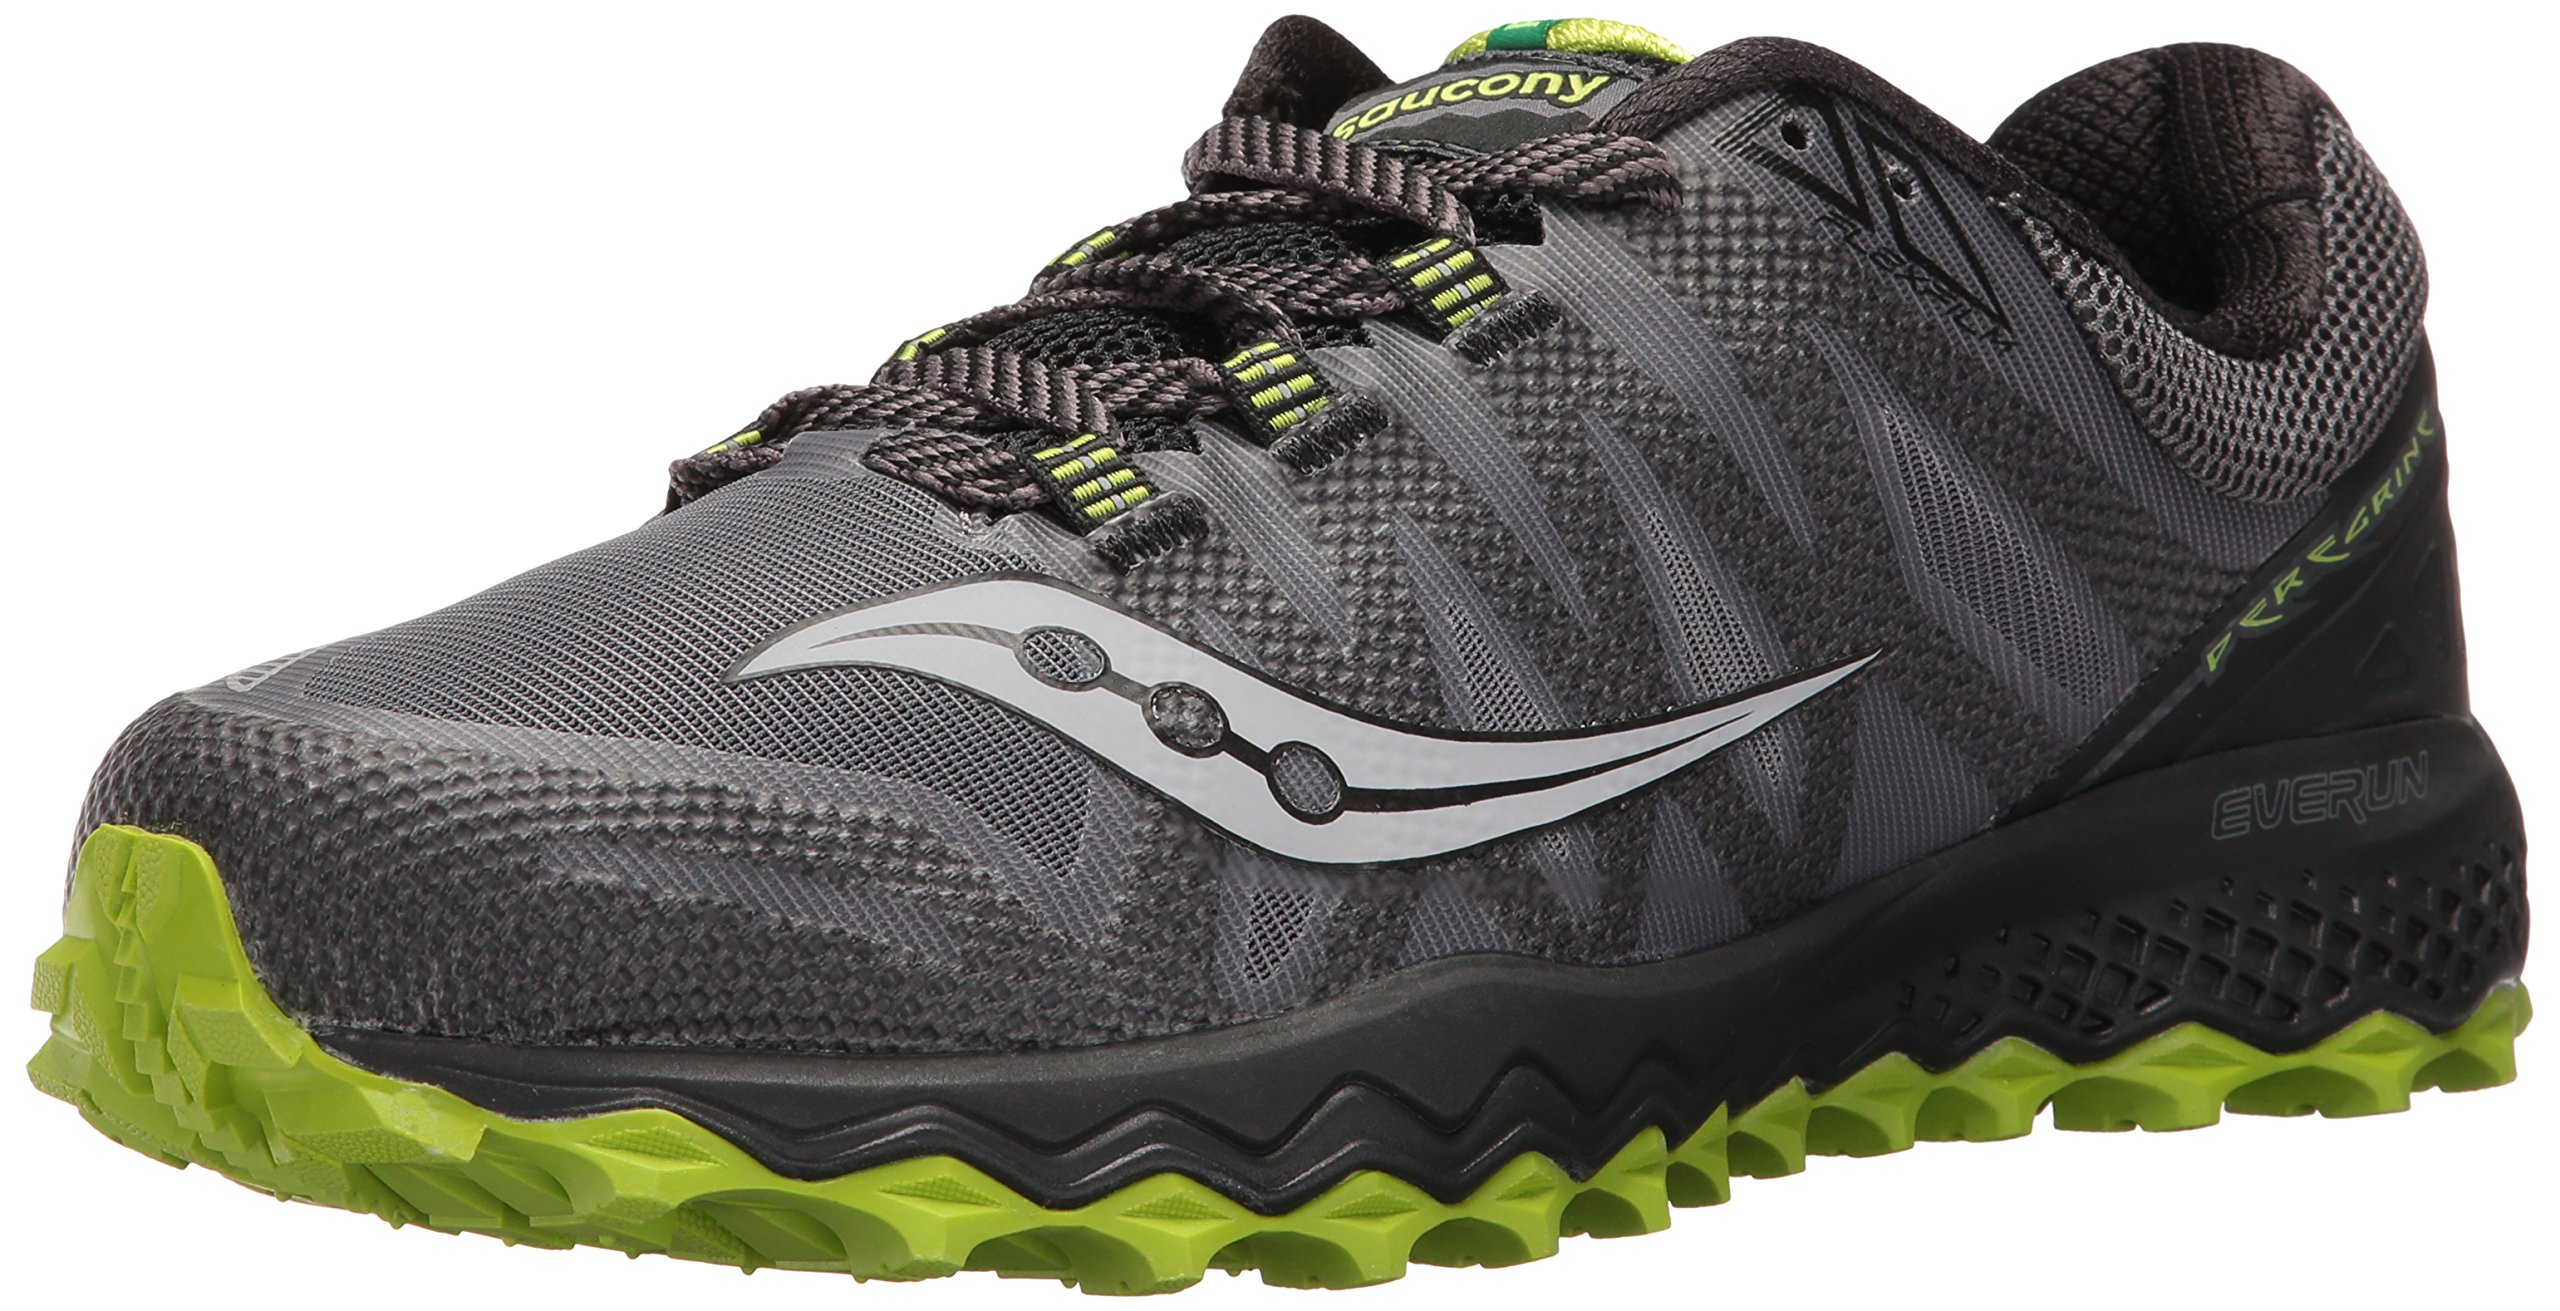 Saucony Men's Peregrine 7 Trail Runner, Grey/Black/Lime, 10.5 M US (S20359-2)